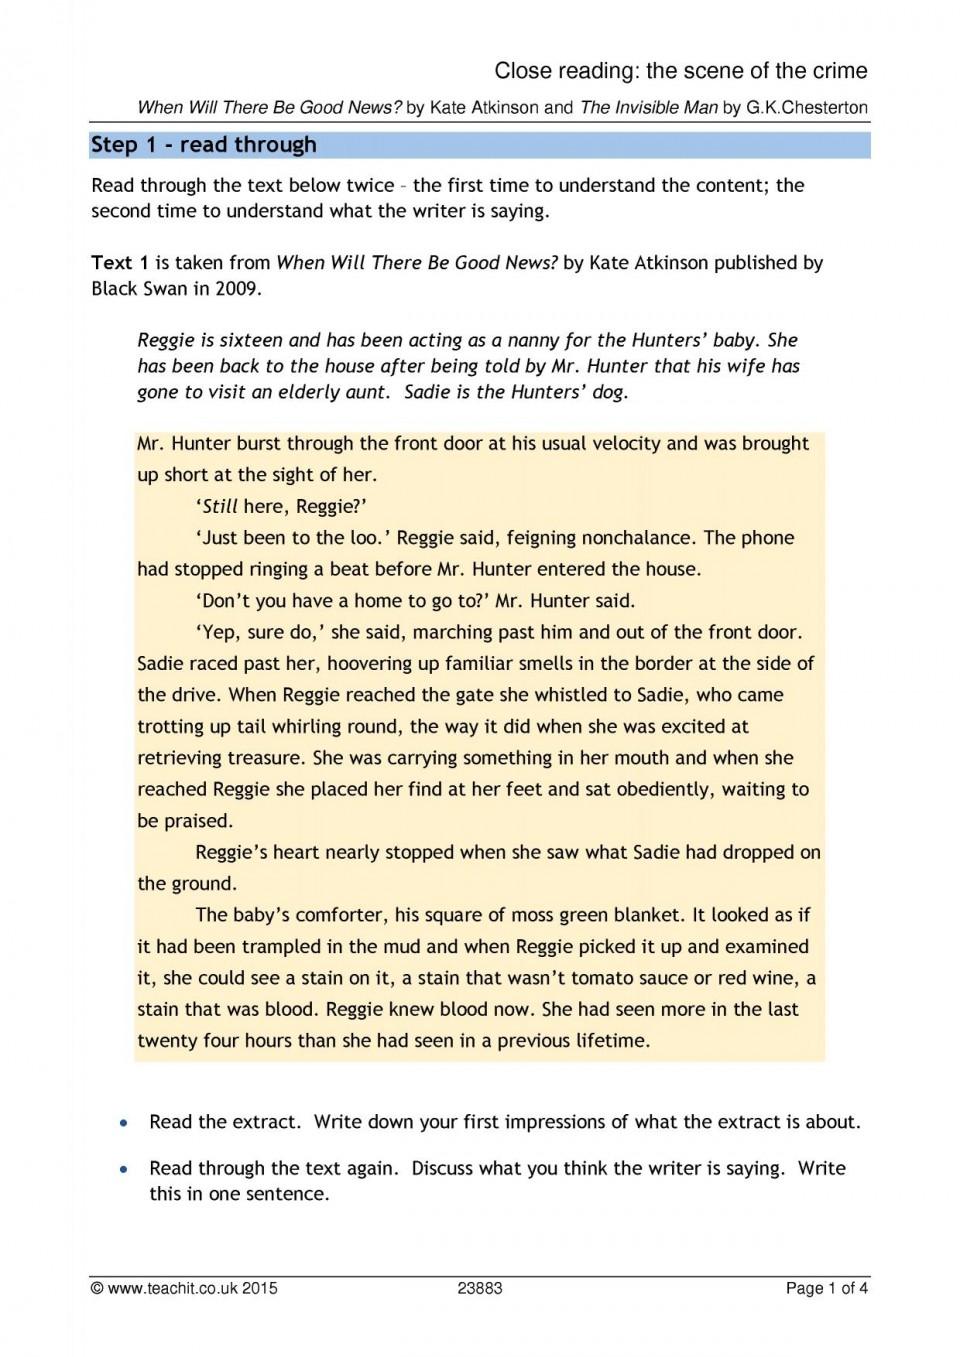 Apa style citation for kindle books